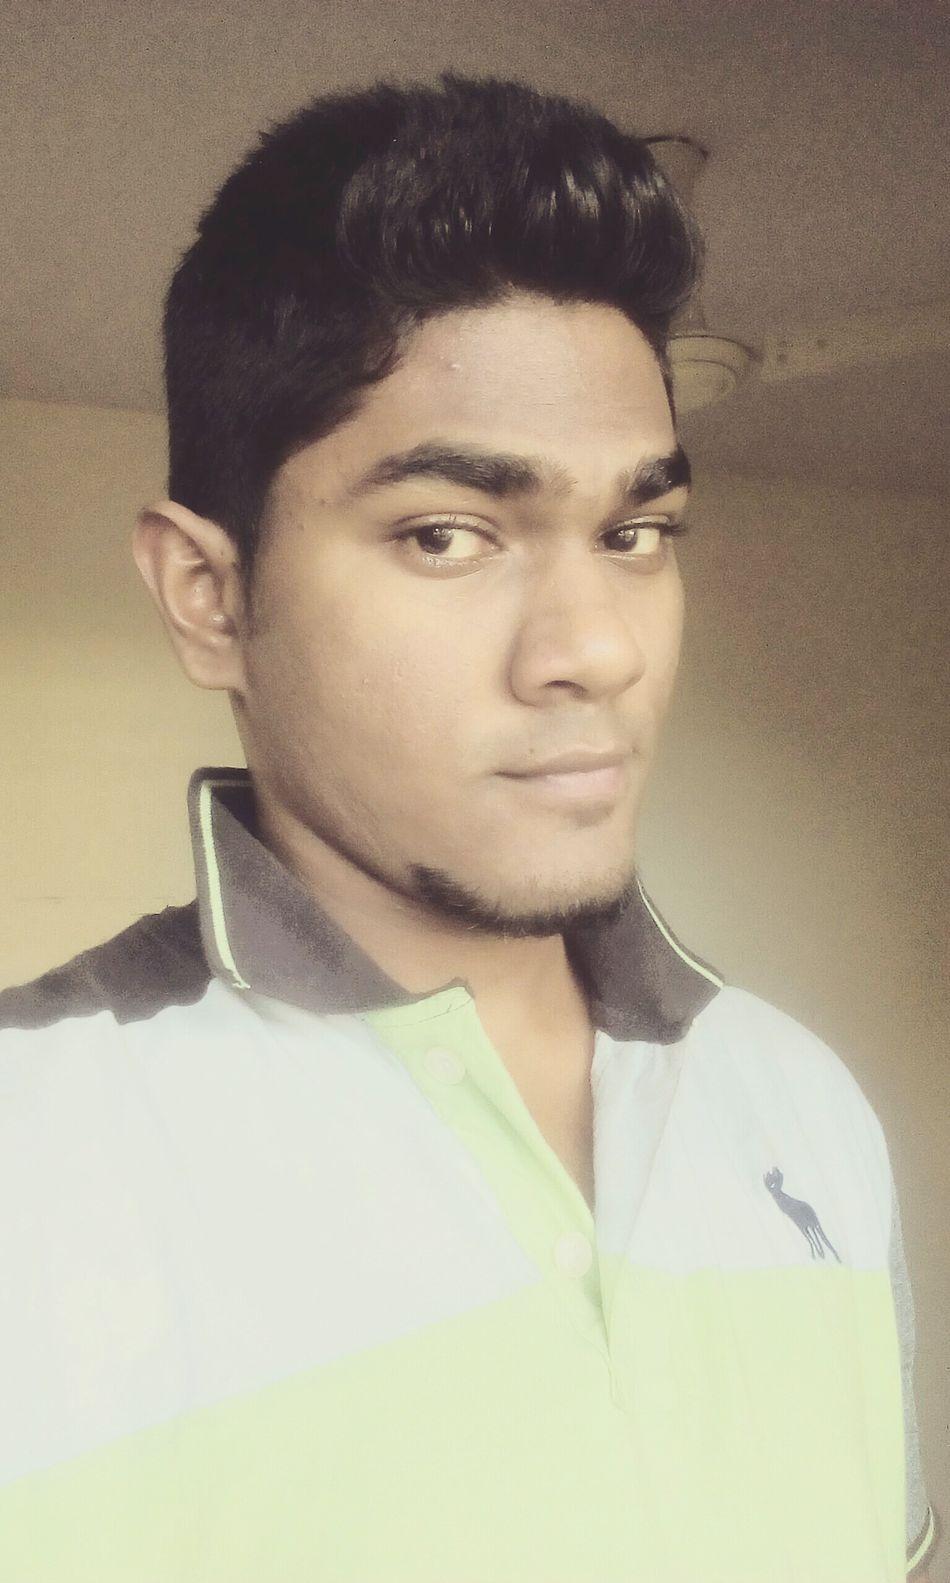 Good Morning Selfie ✌ Afreshtouch No Moustache 😍😌😊